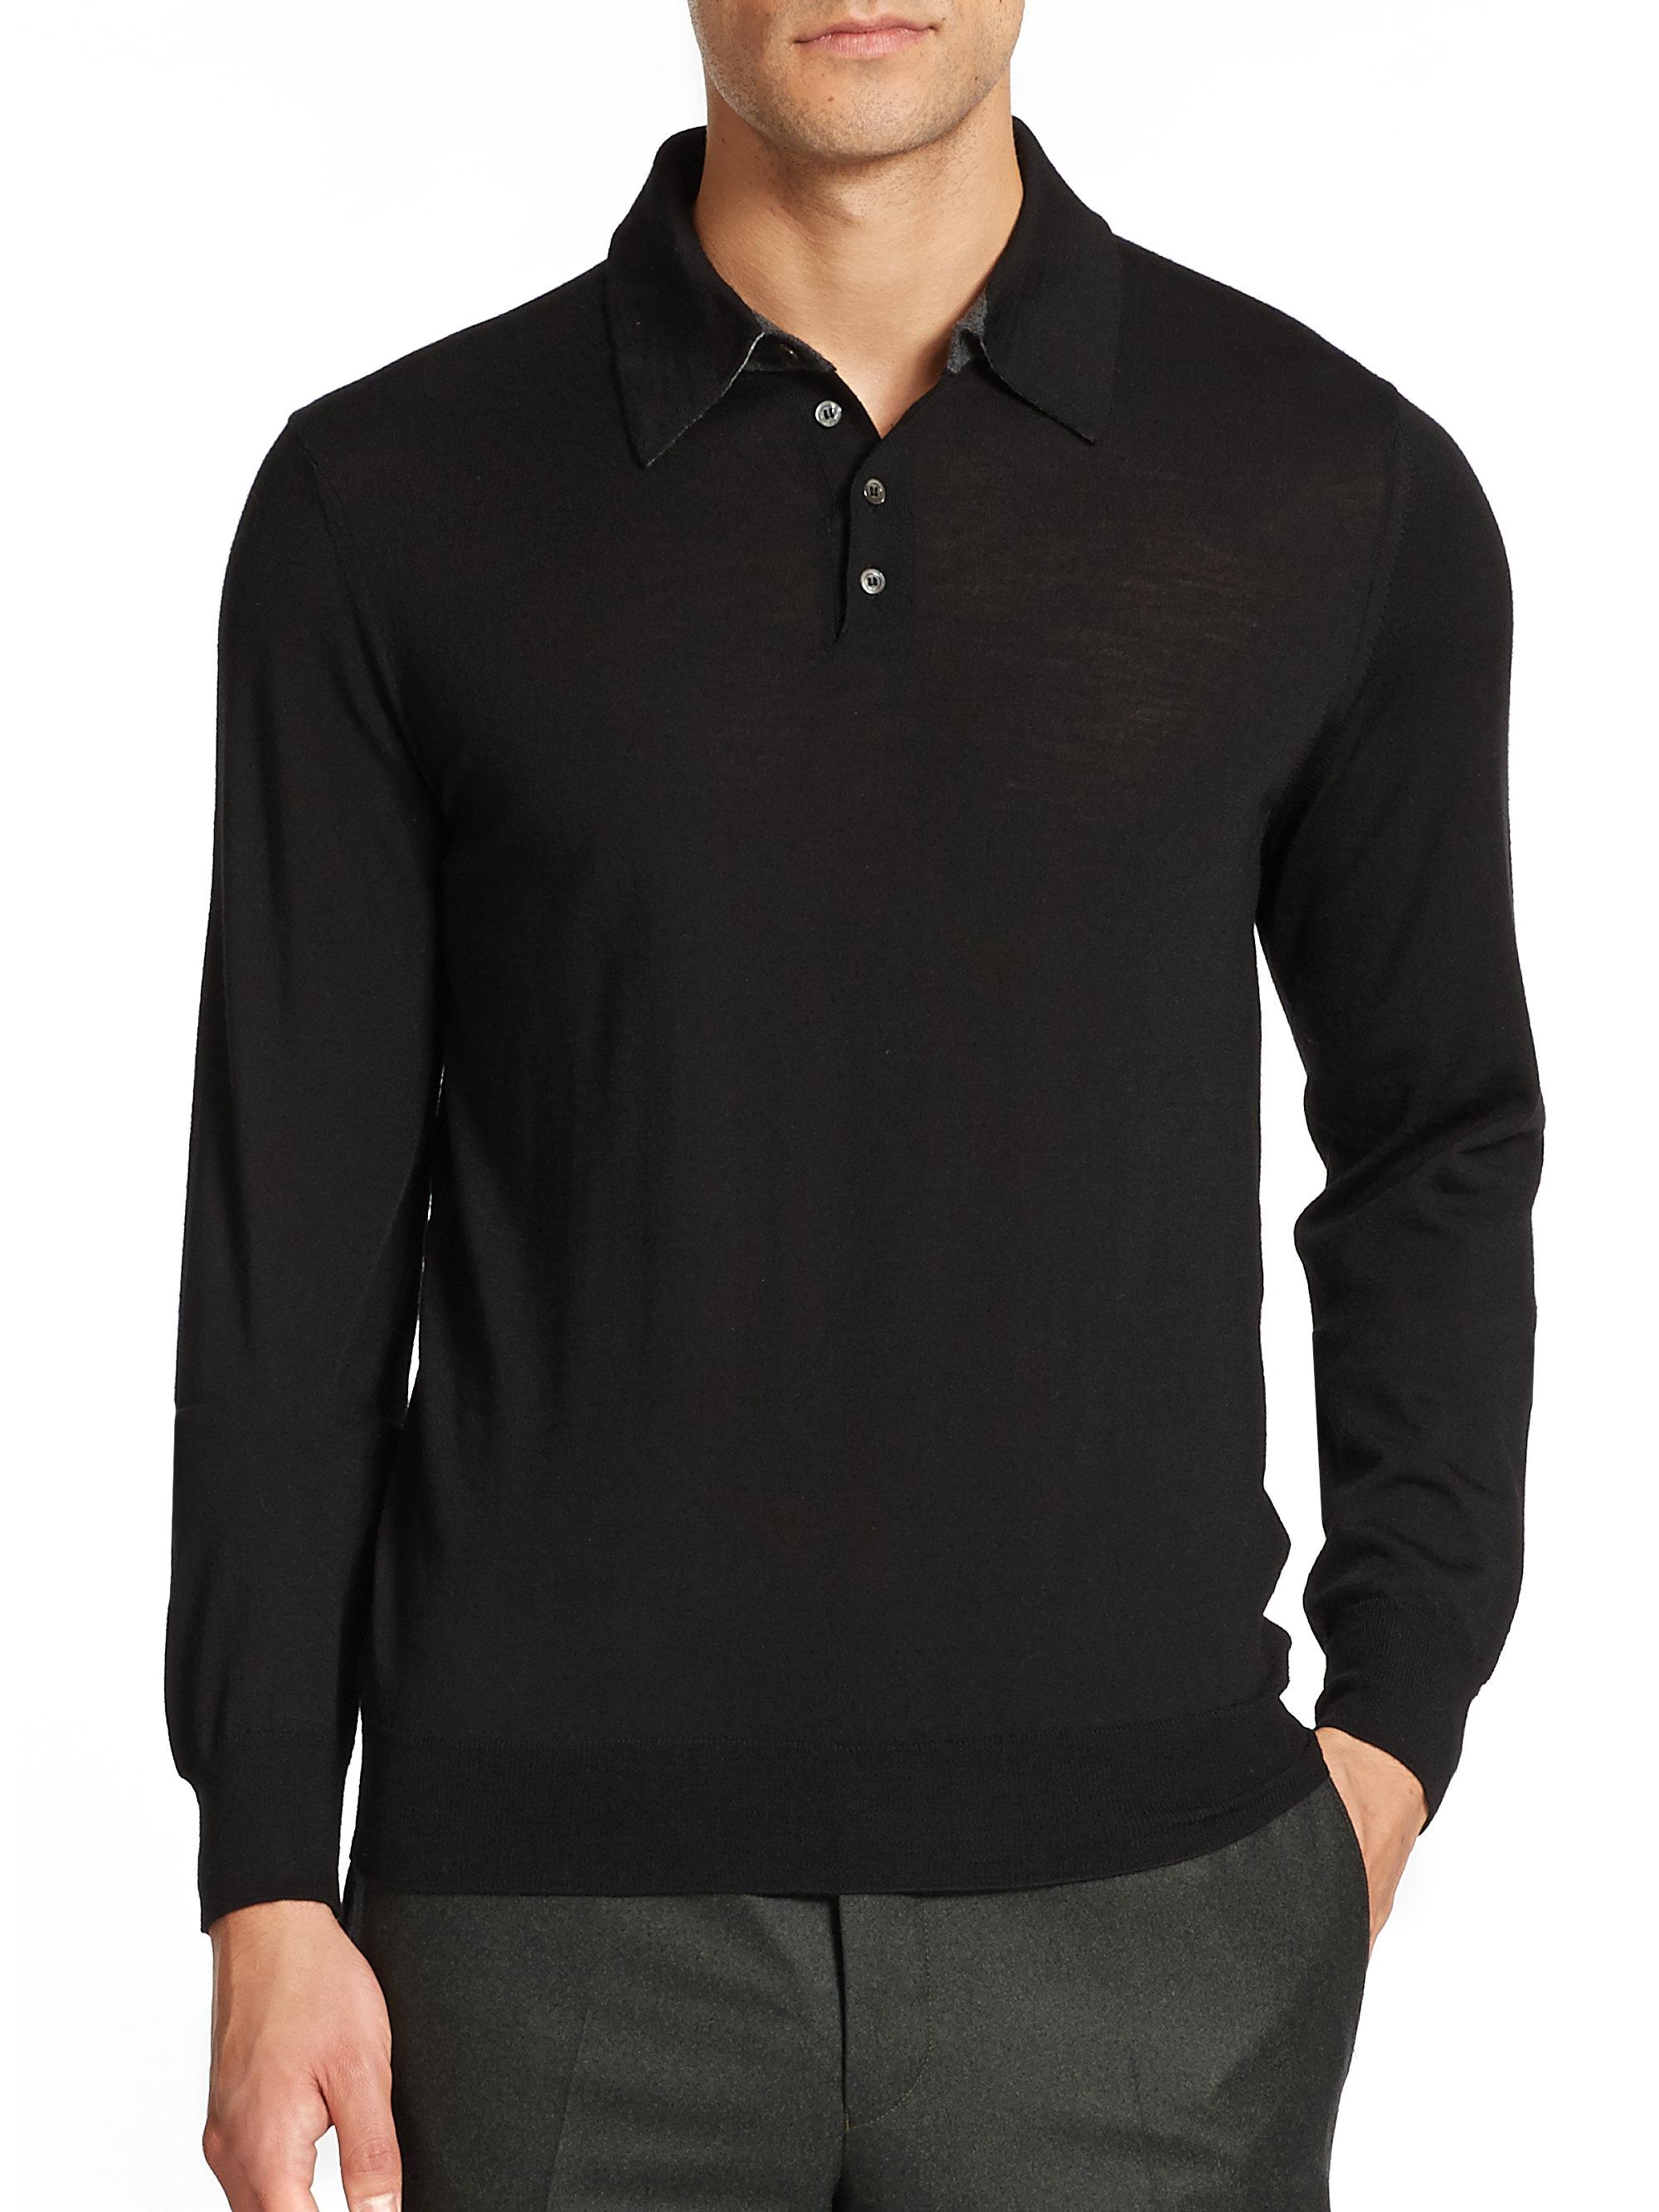 Robert Graham Designer Shirts Saks fifth avenue Meri...